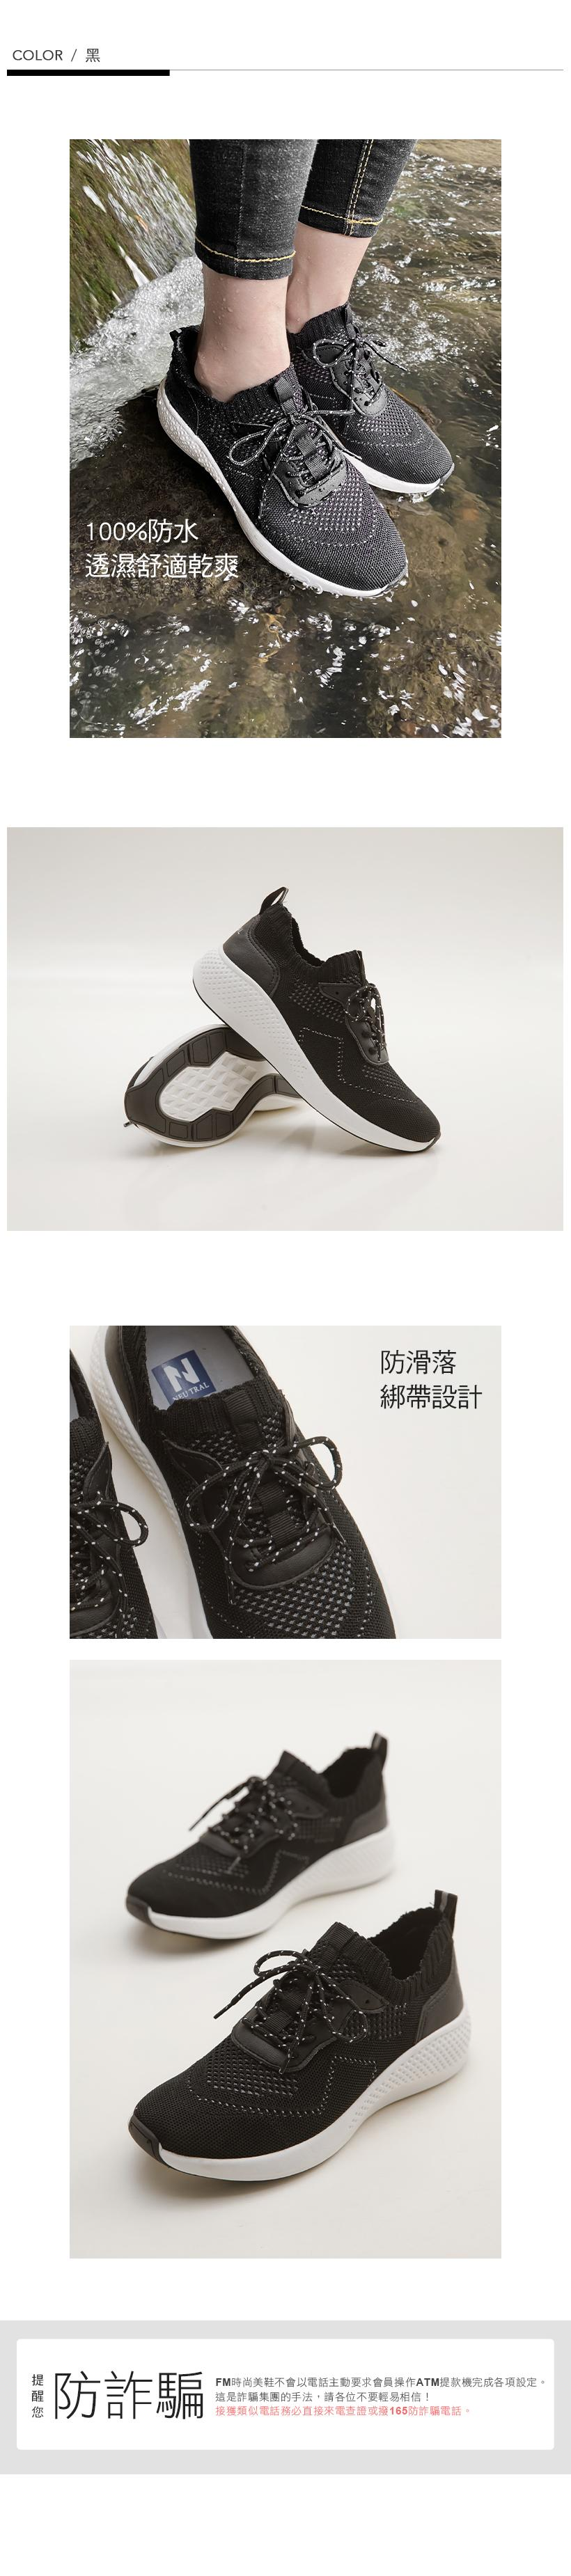 NeuTral-森山系飛織襪套國民防水鞋(黑)-男女款